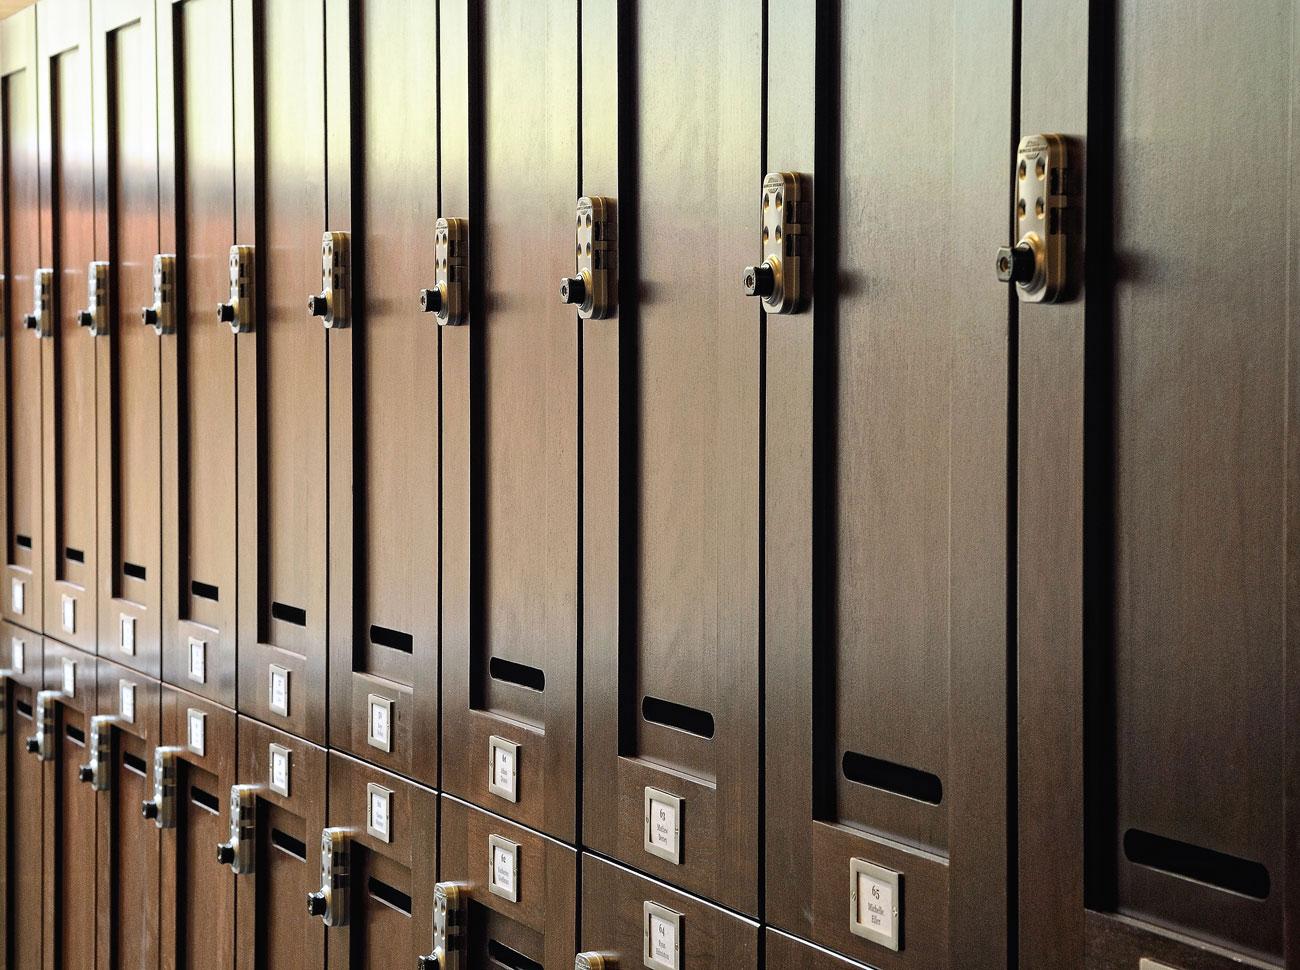 ohio-state-law-school-one-row-lockers-(1).jpg